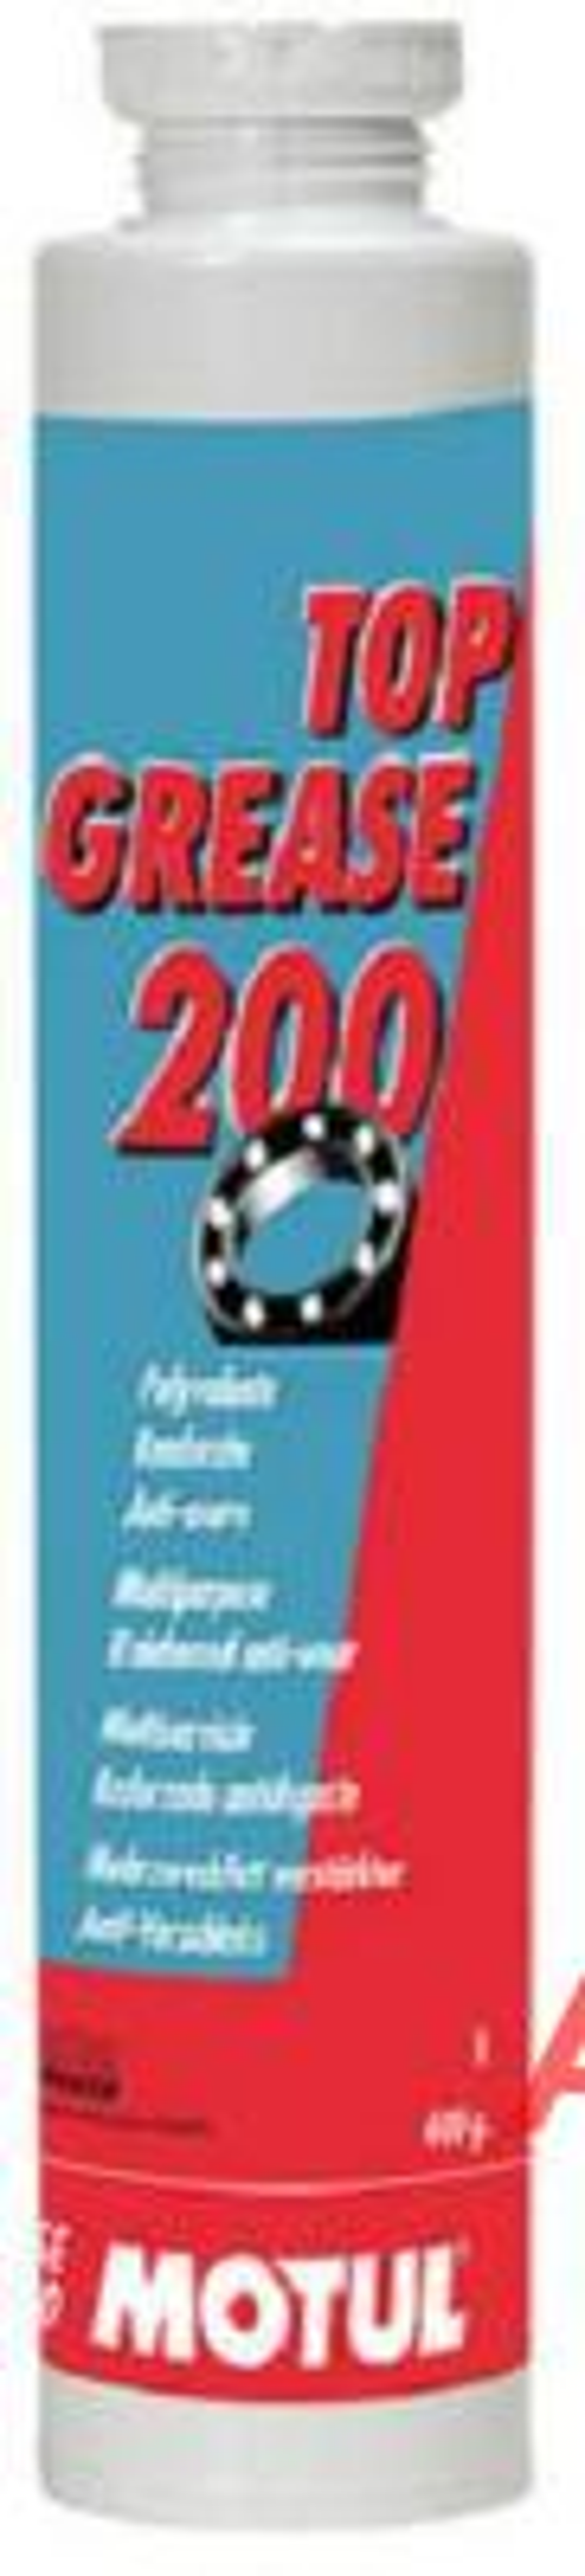 Смазка поливалентная Top Grease 200